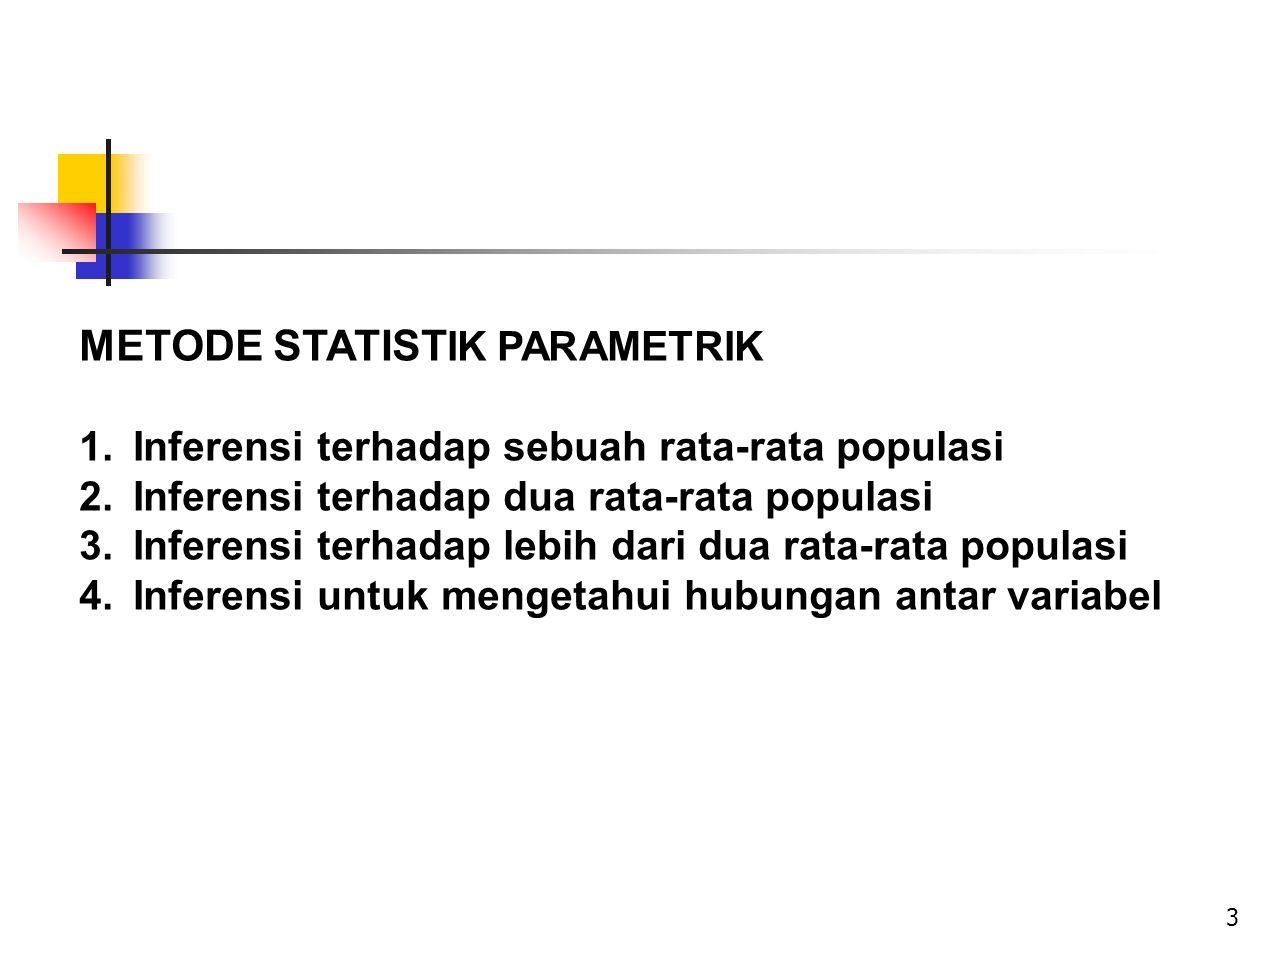 METODE STATISTIK PARAMETRIK